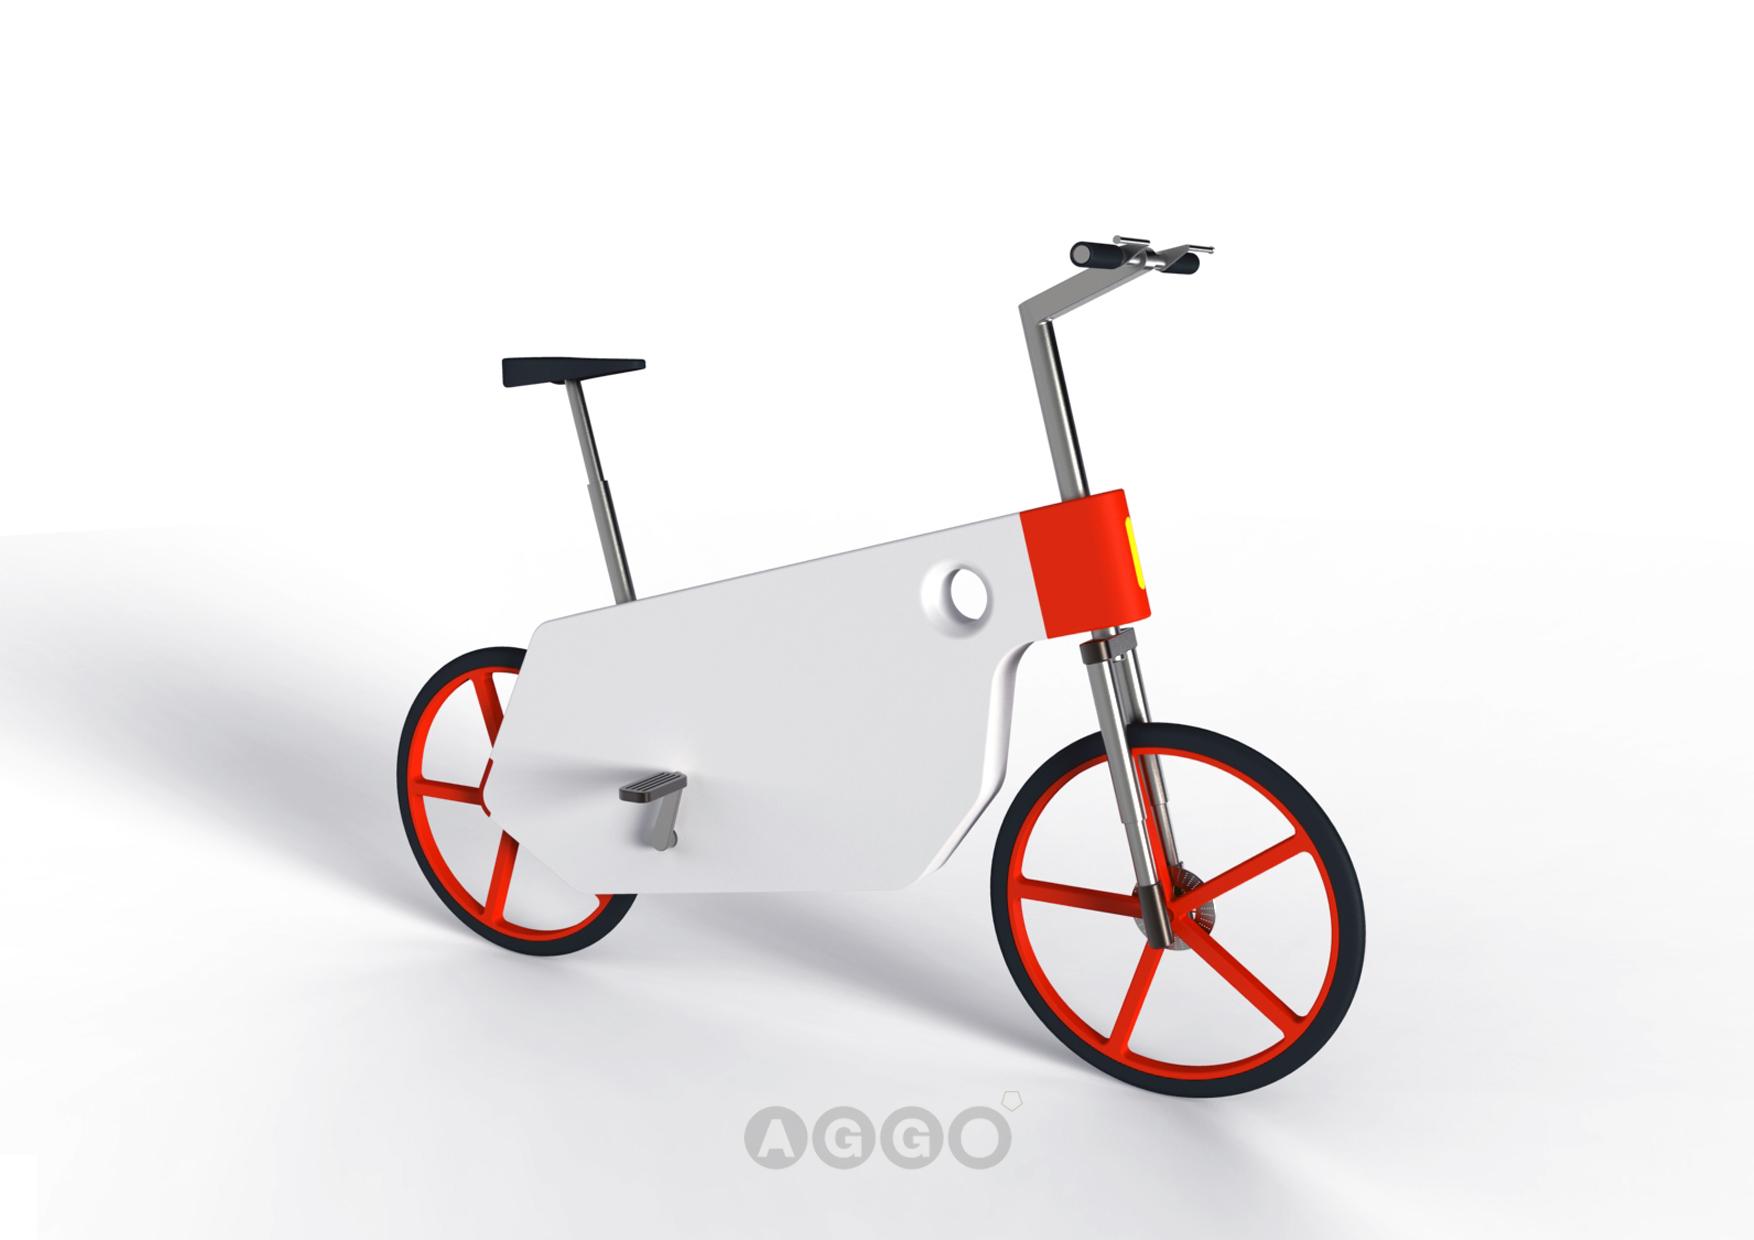 aggo_tesla_bike006.jpg